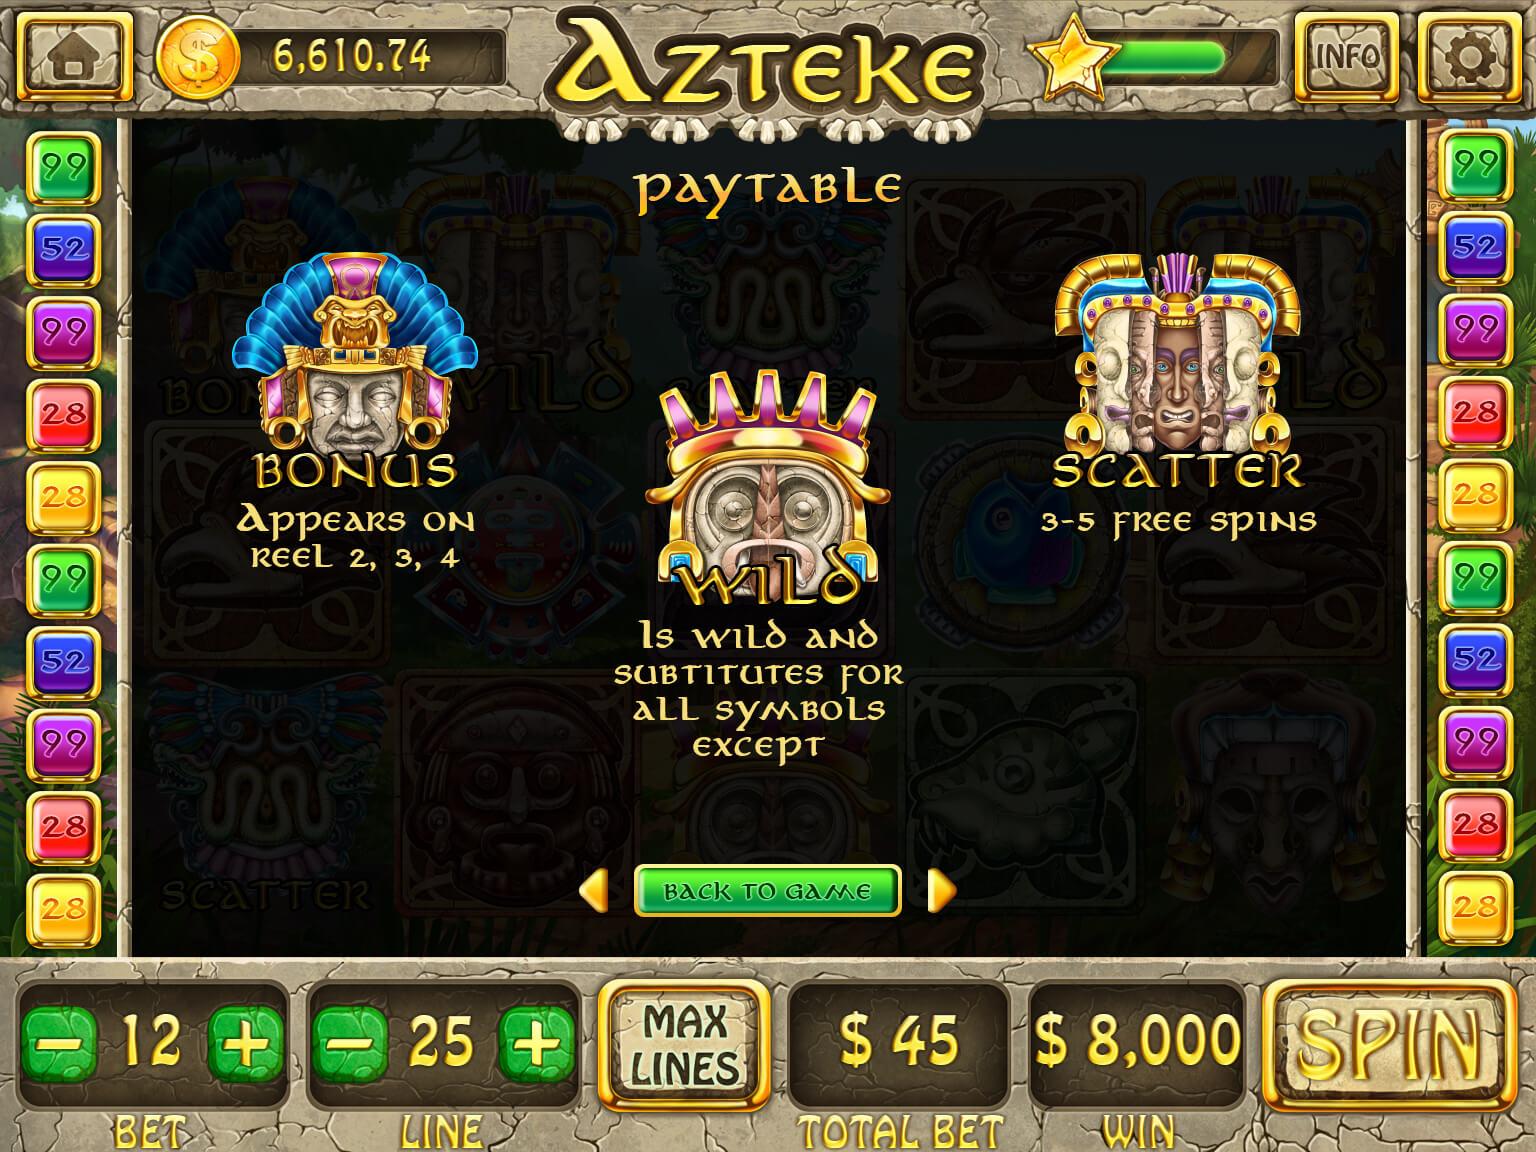 azteke_paytable_1